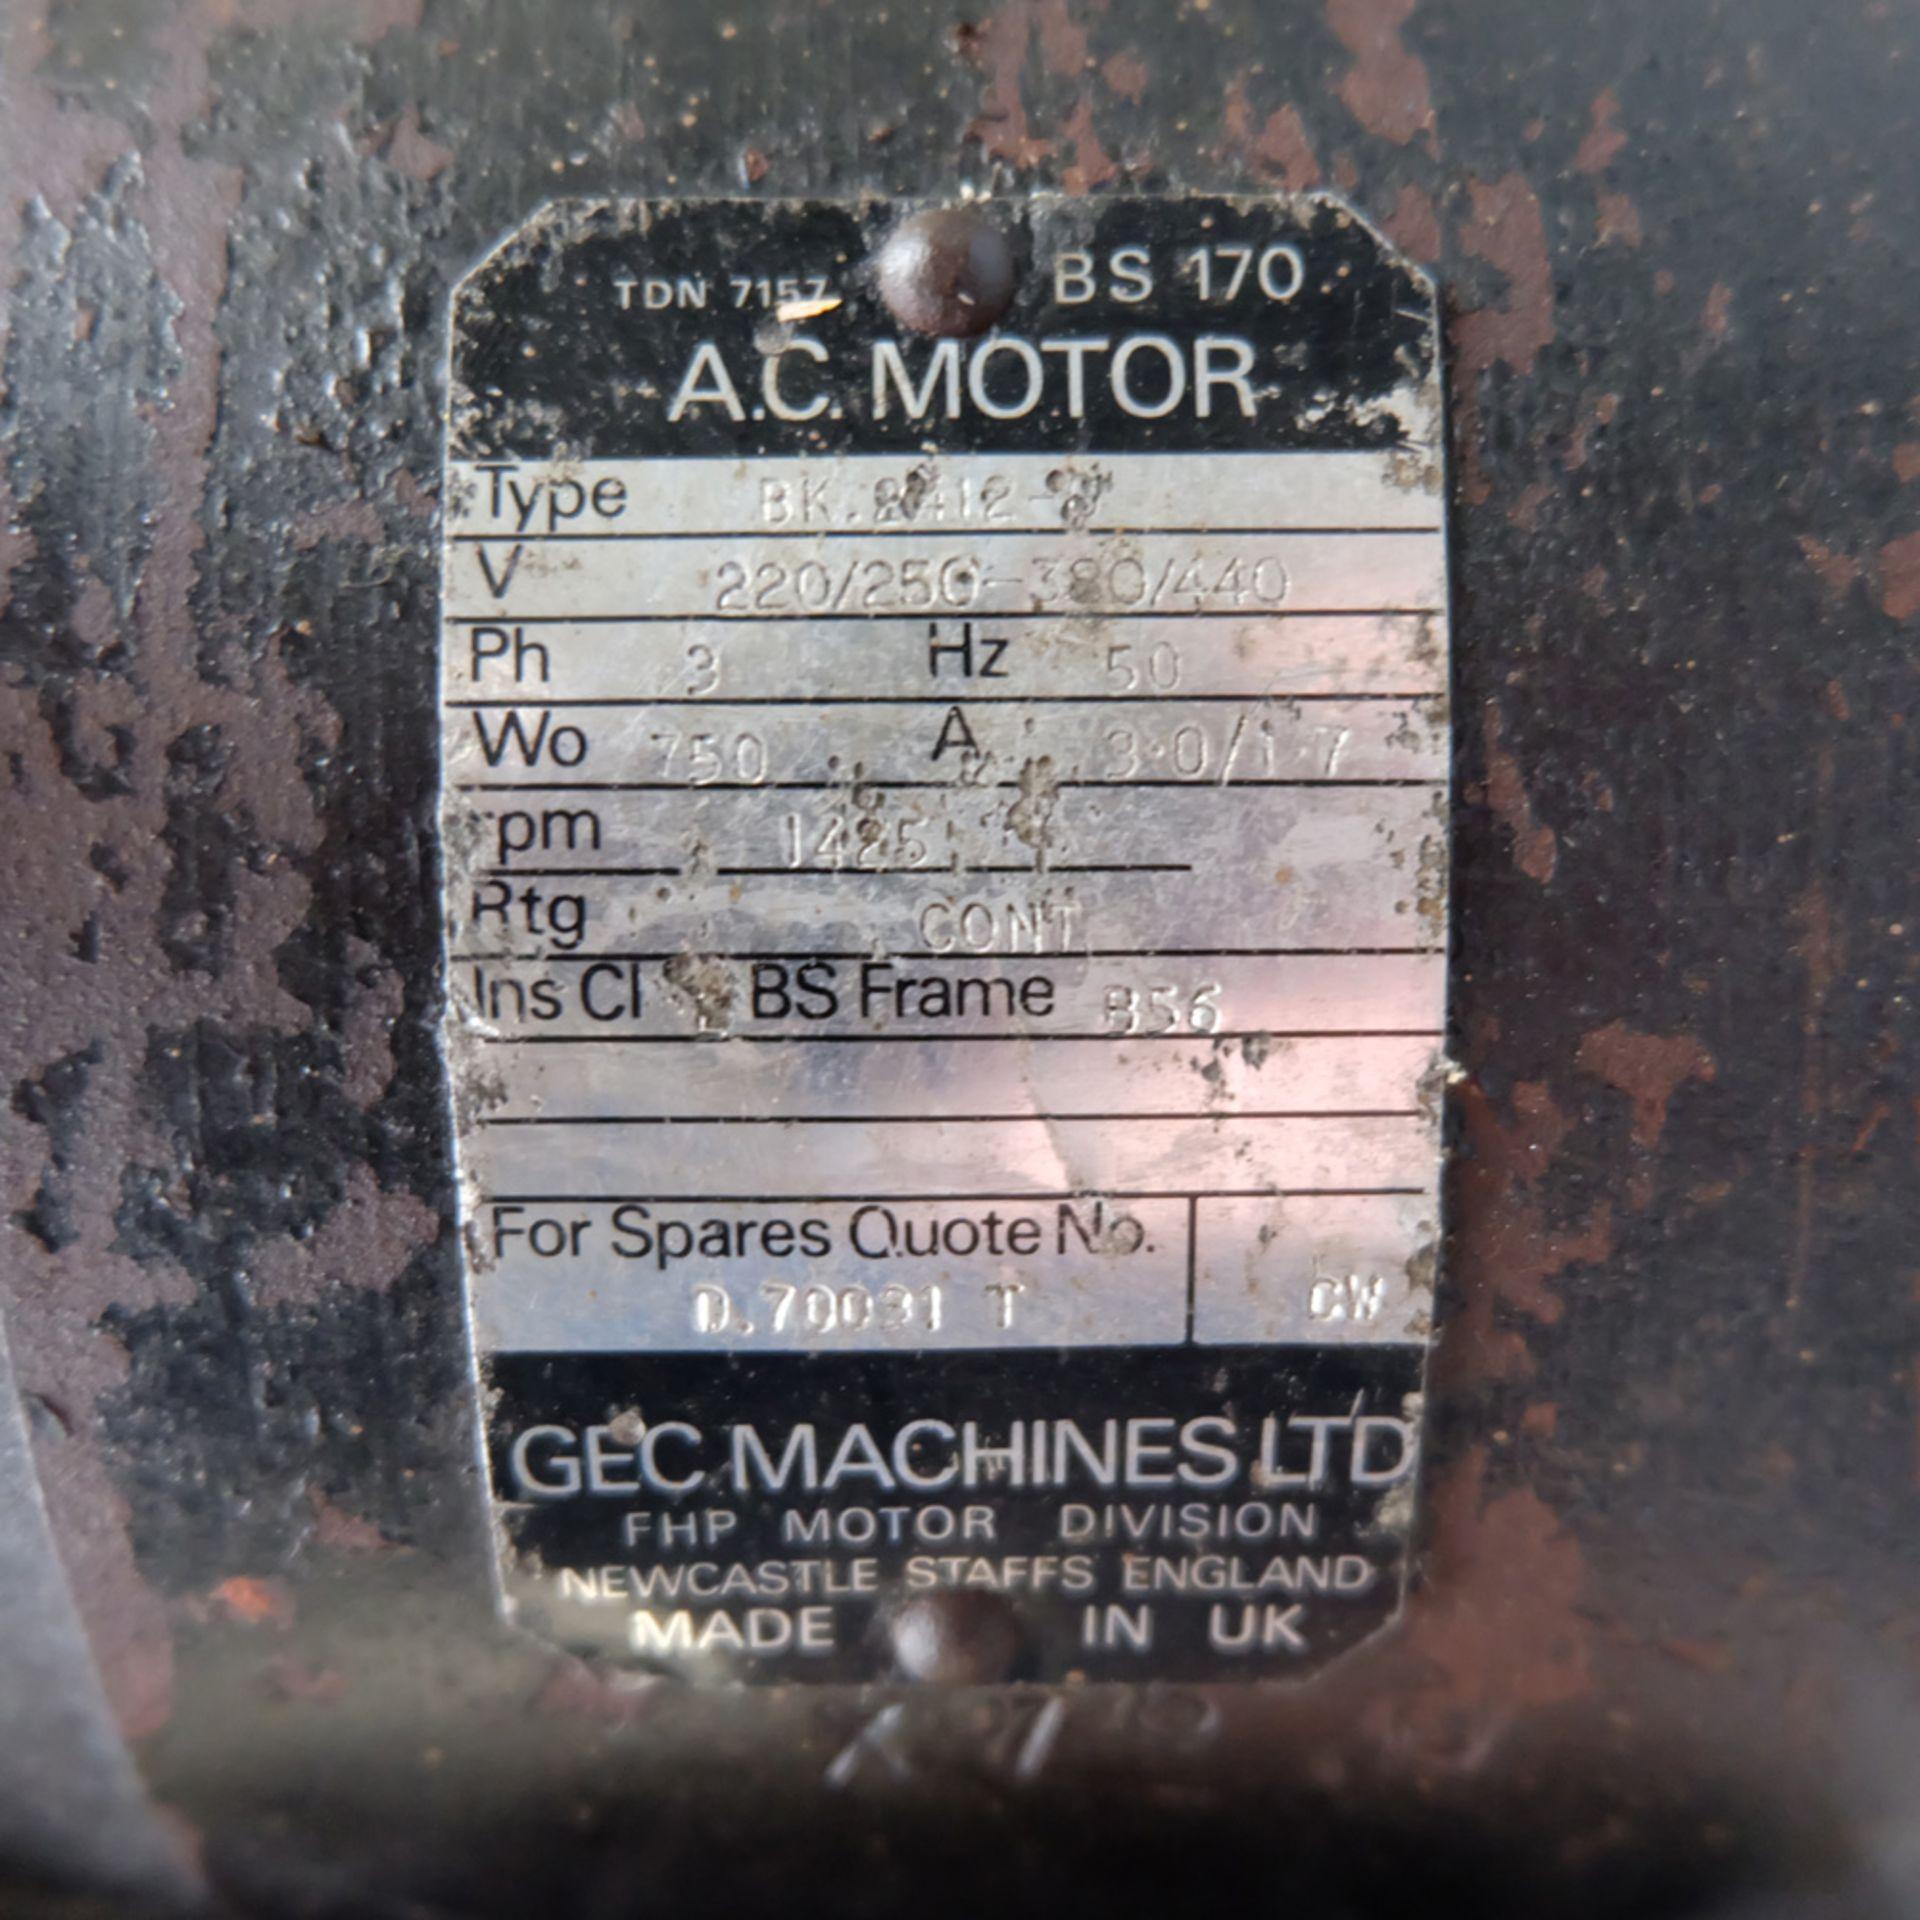 Startrite Mecury 5 Speed Bench Drill. Speeds 530 - 3830rpm. 3 Phase. - Image 4 of 5